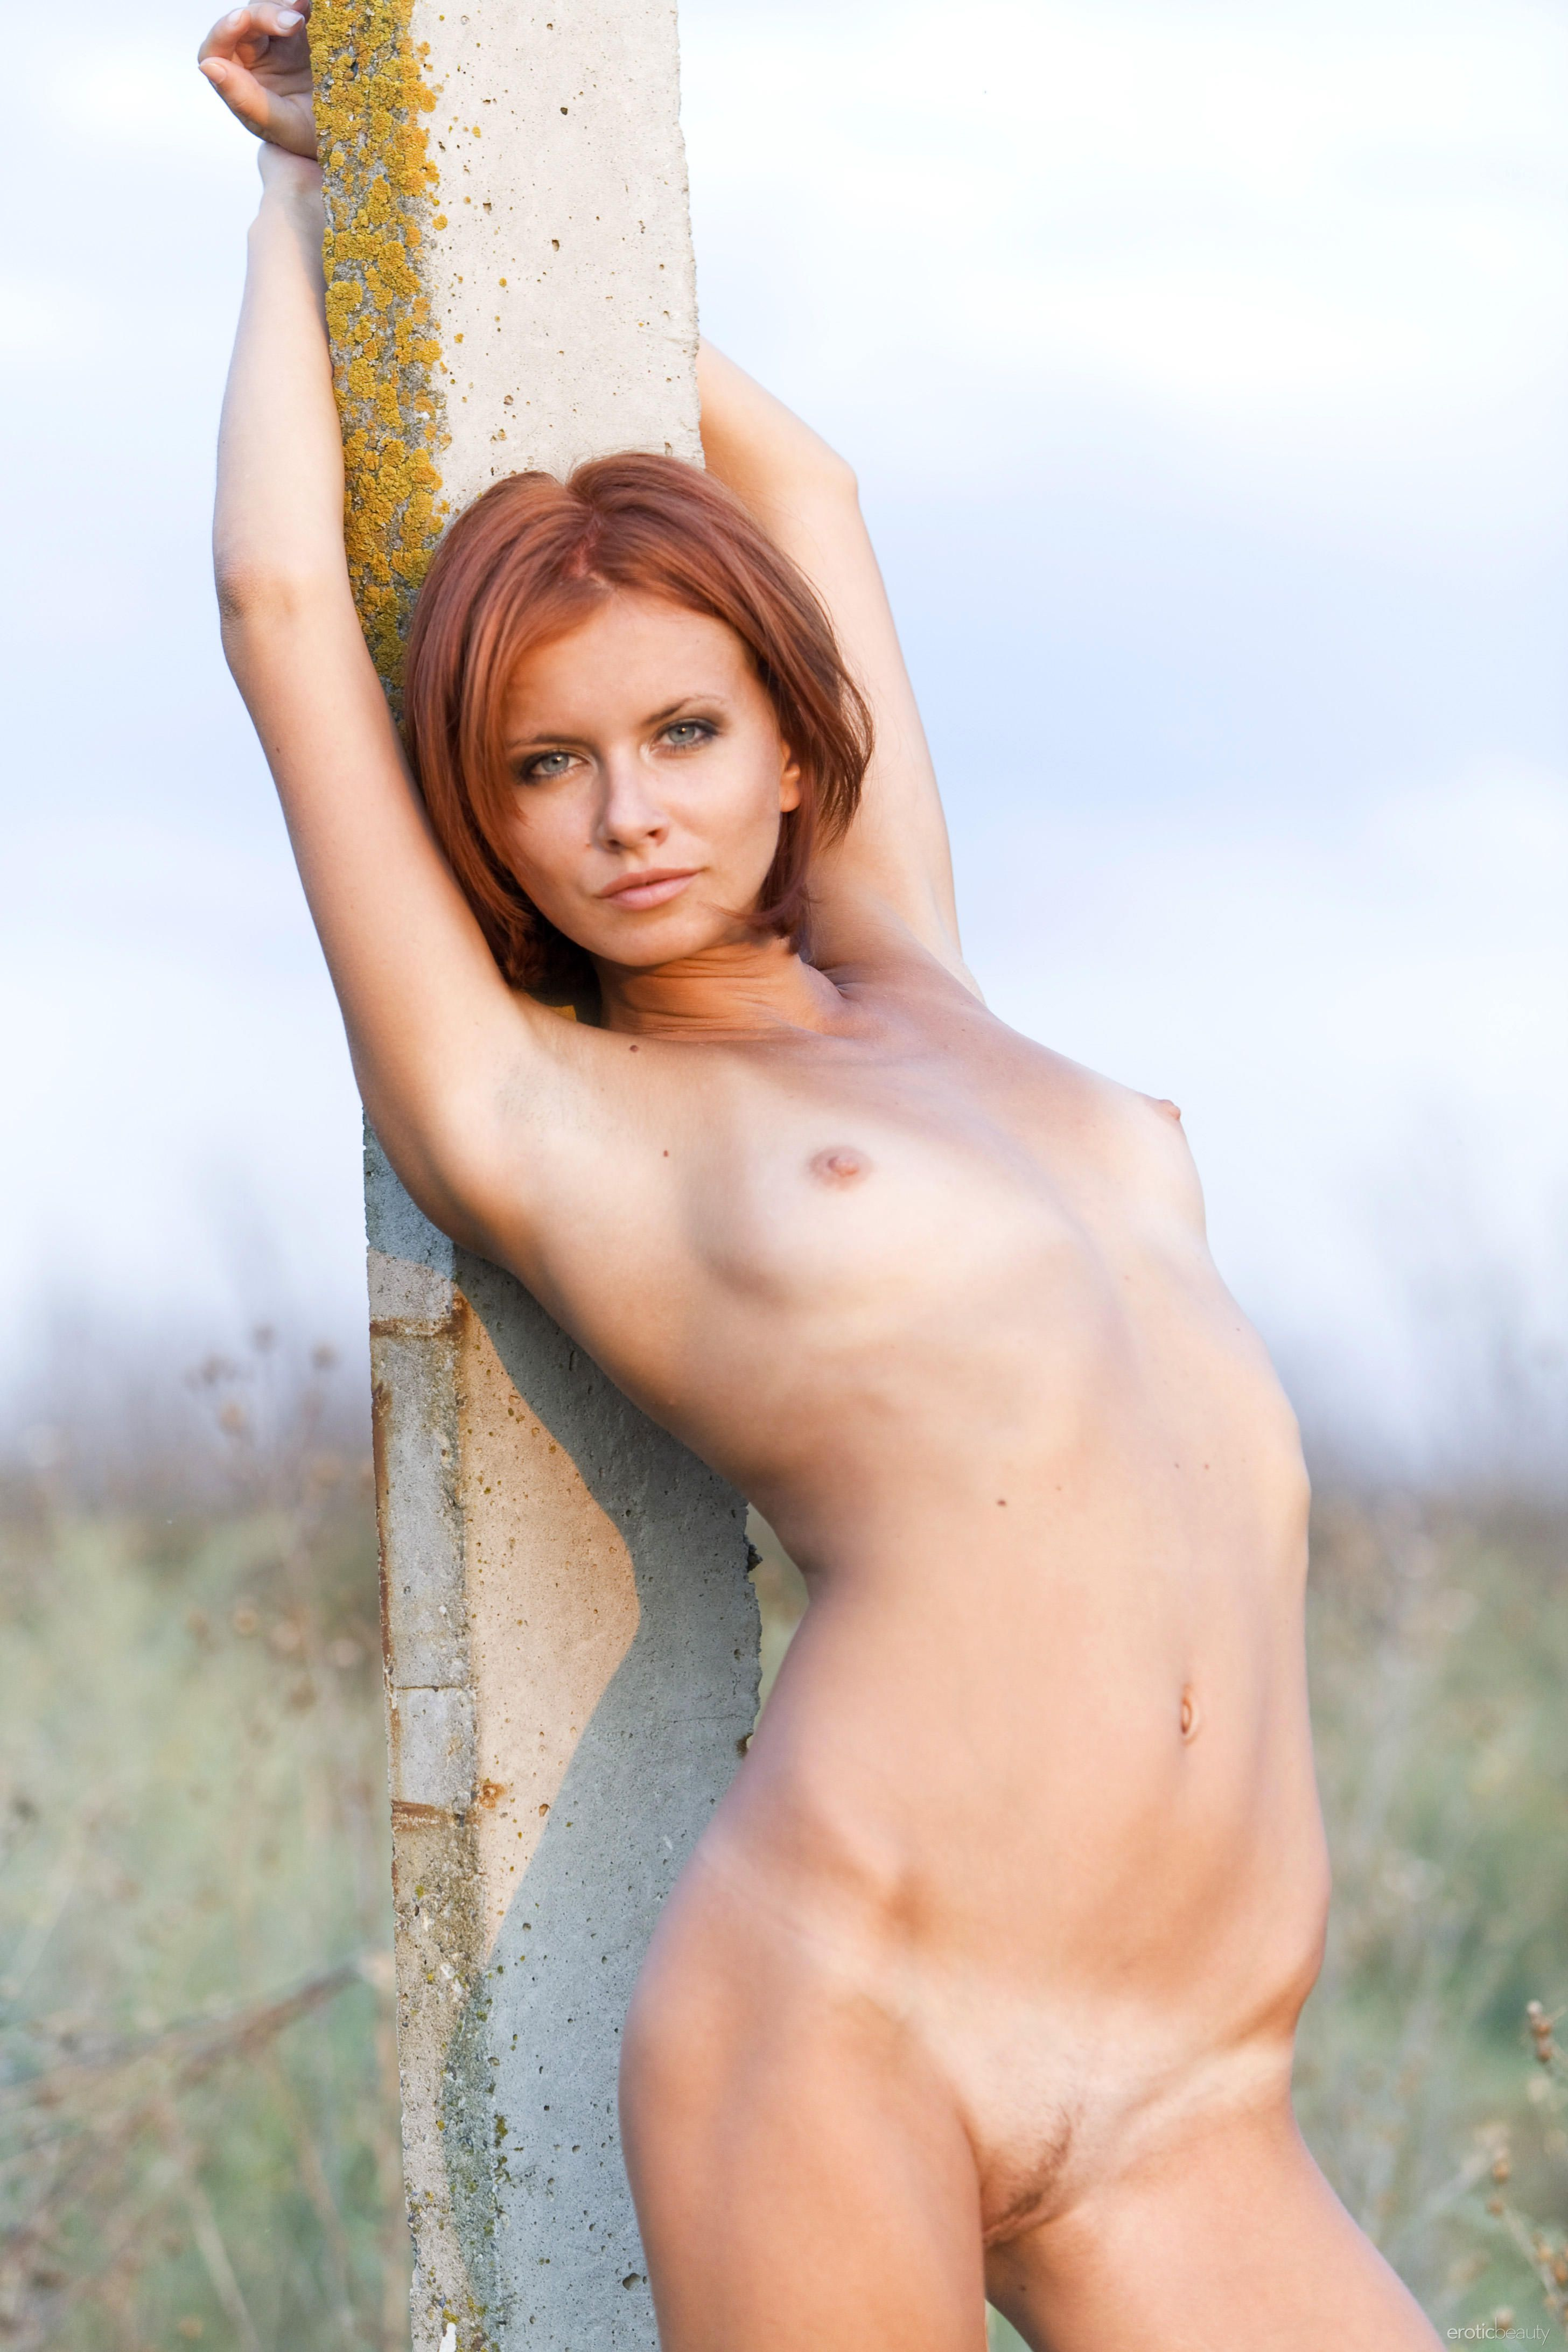 http://i5.imageban.ru/out/2013/05/22/c58653e511450885361b99dc8fce0e1b.jpg